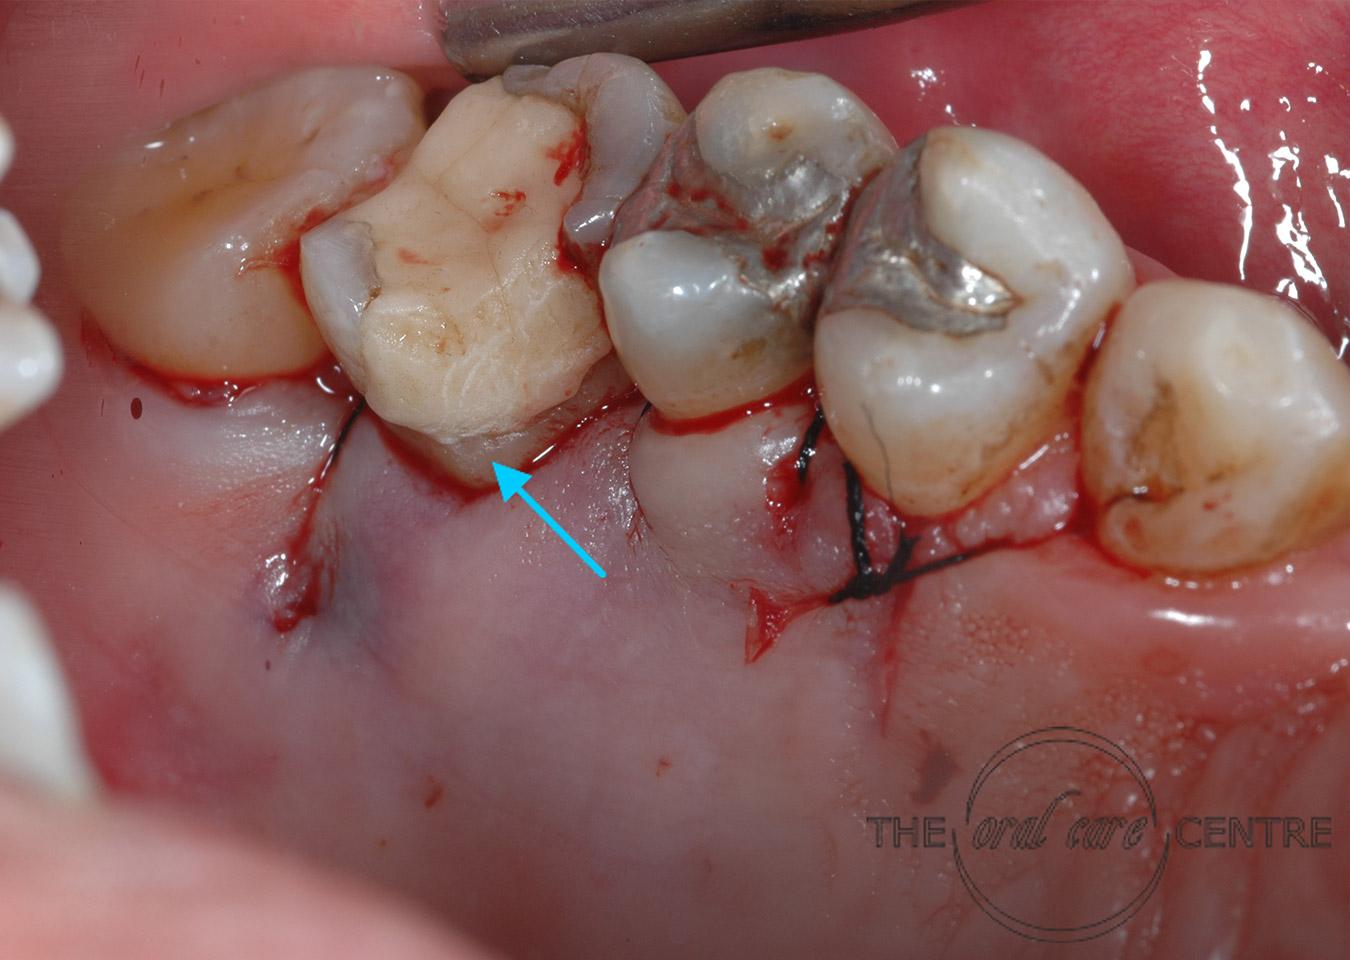 Exposed fracture margins